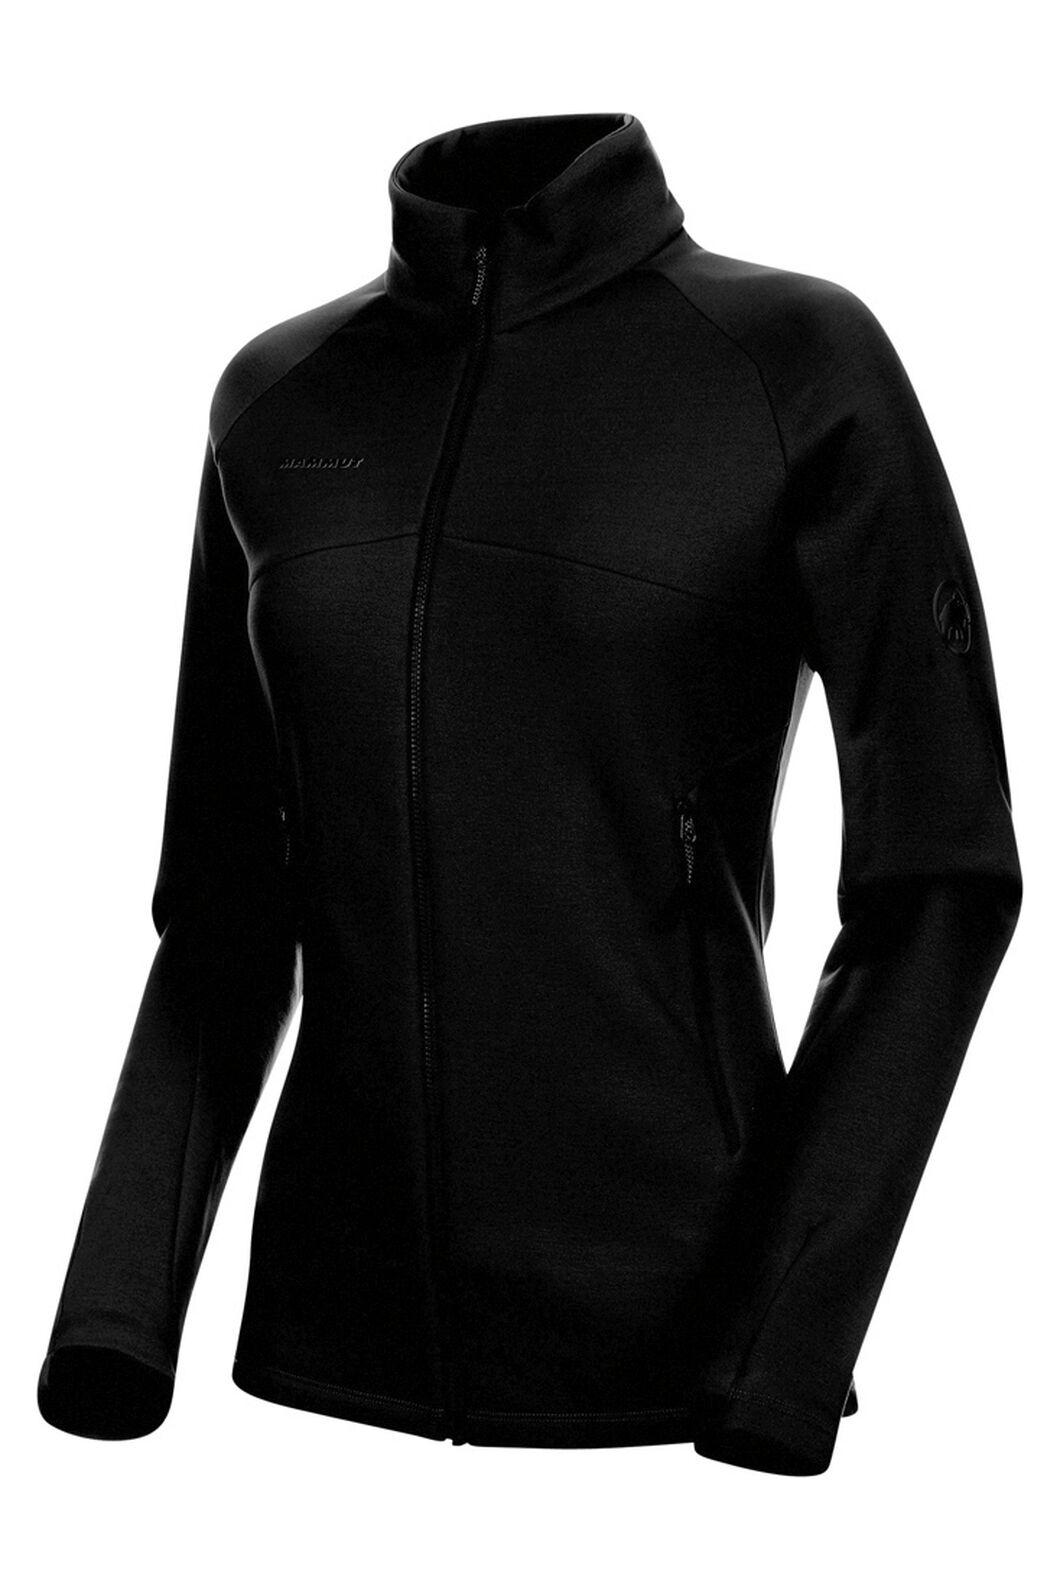 Mammut Aconcagua Mid Layer Jacket — Women's, Black, hi-res